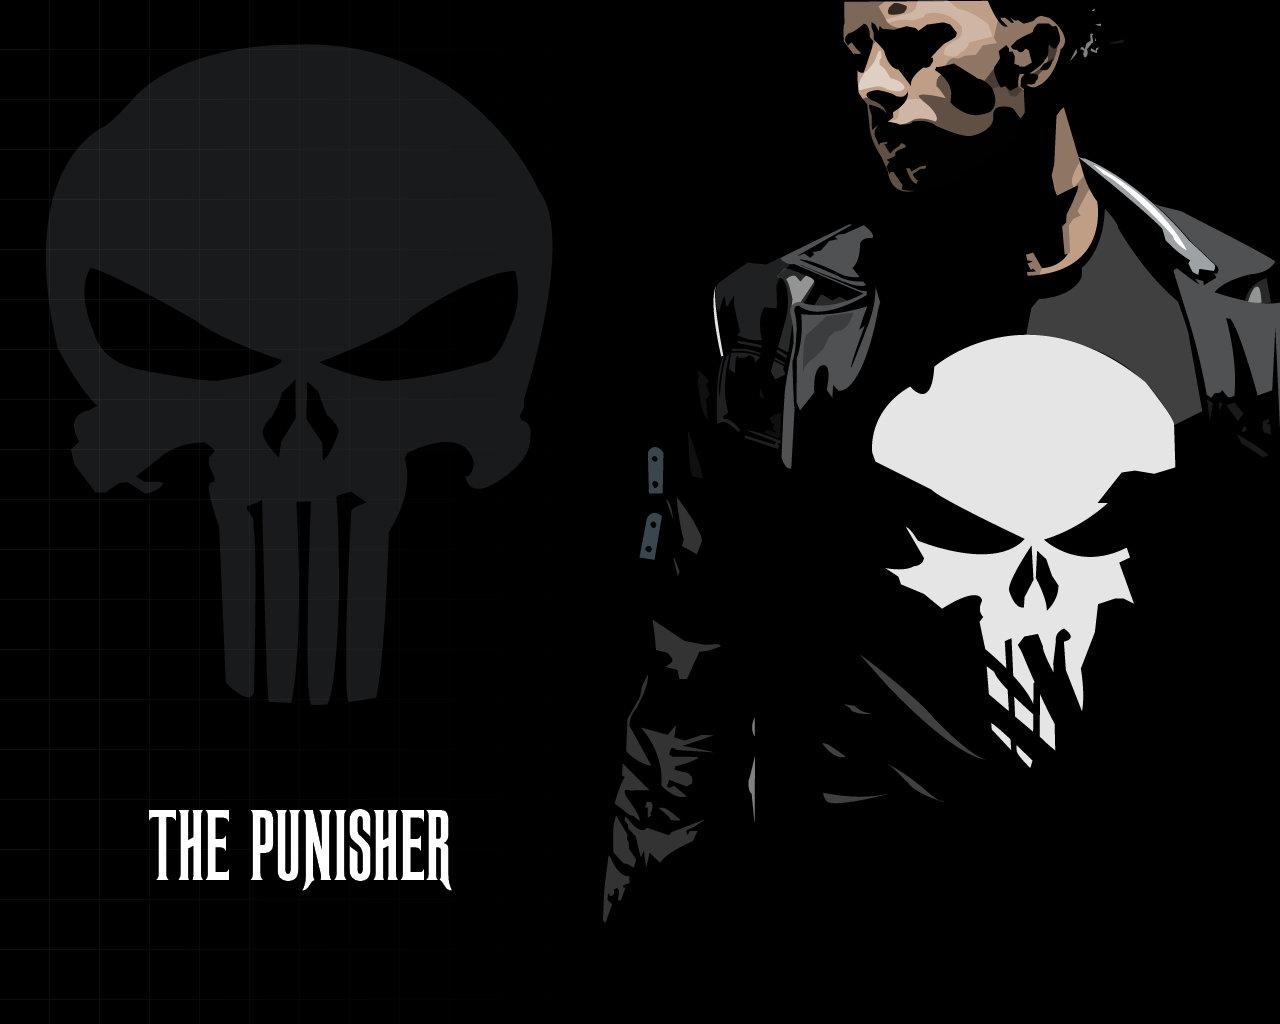 The Punisher Wallpaper by Namelessv1 1280x1024